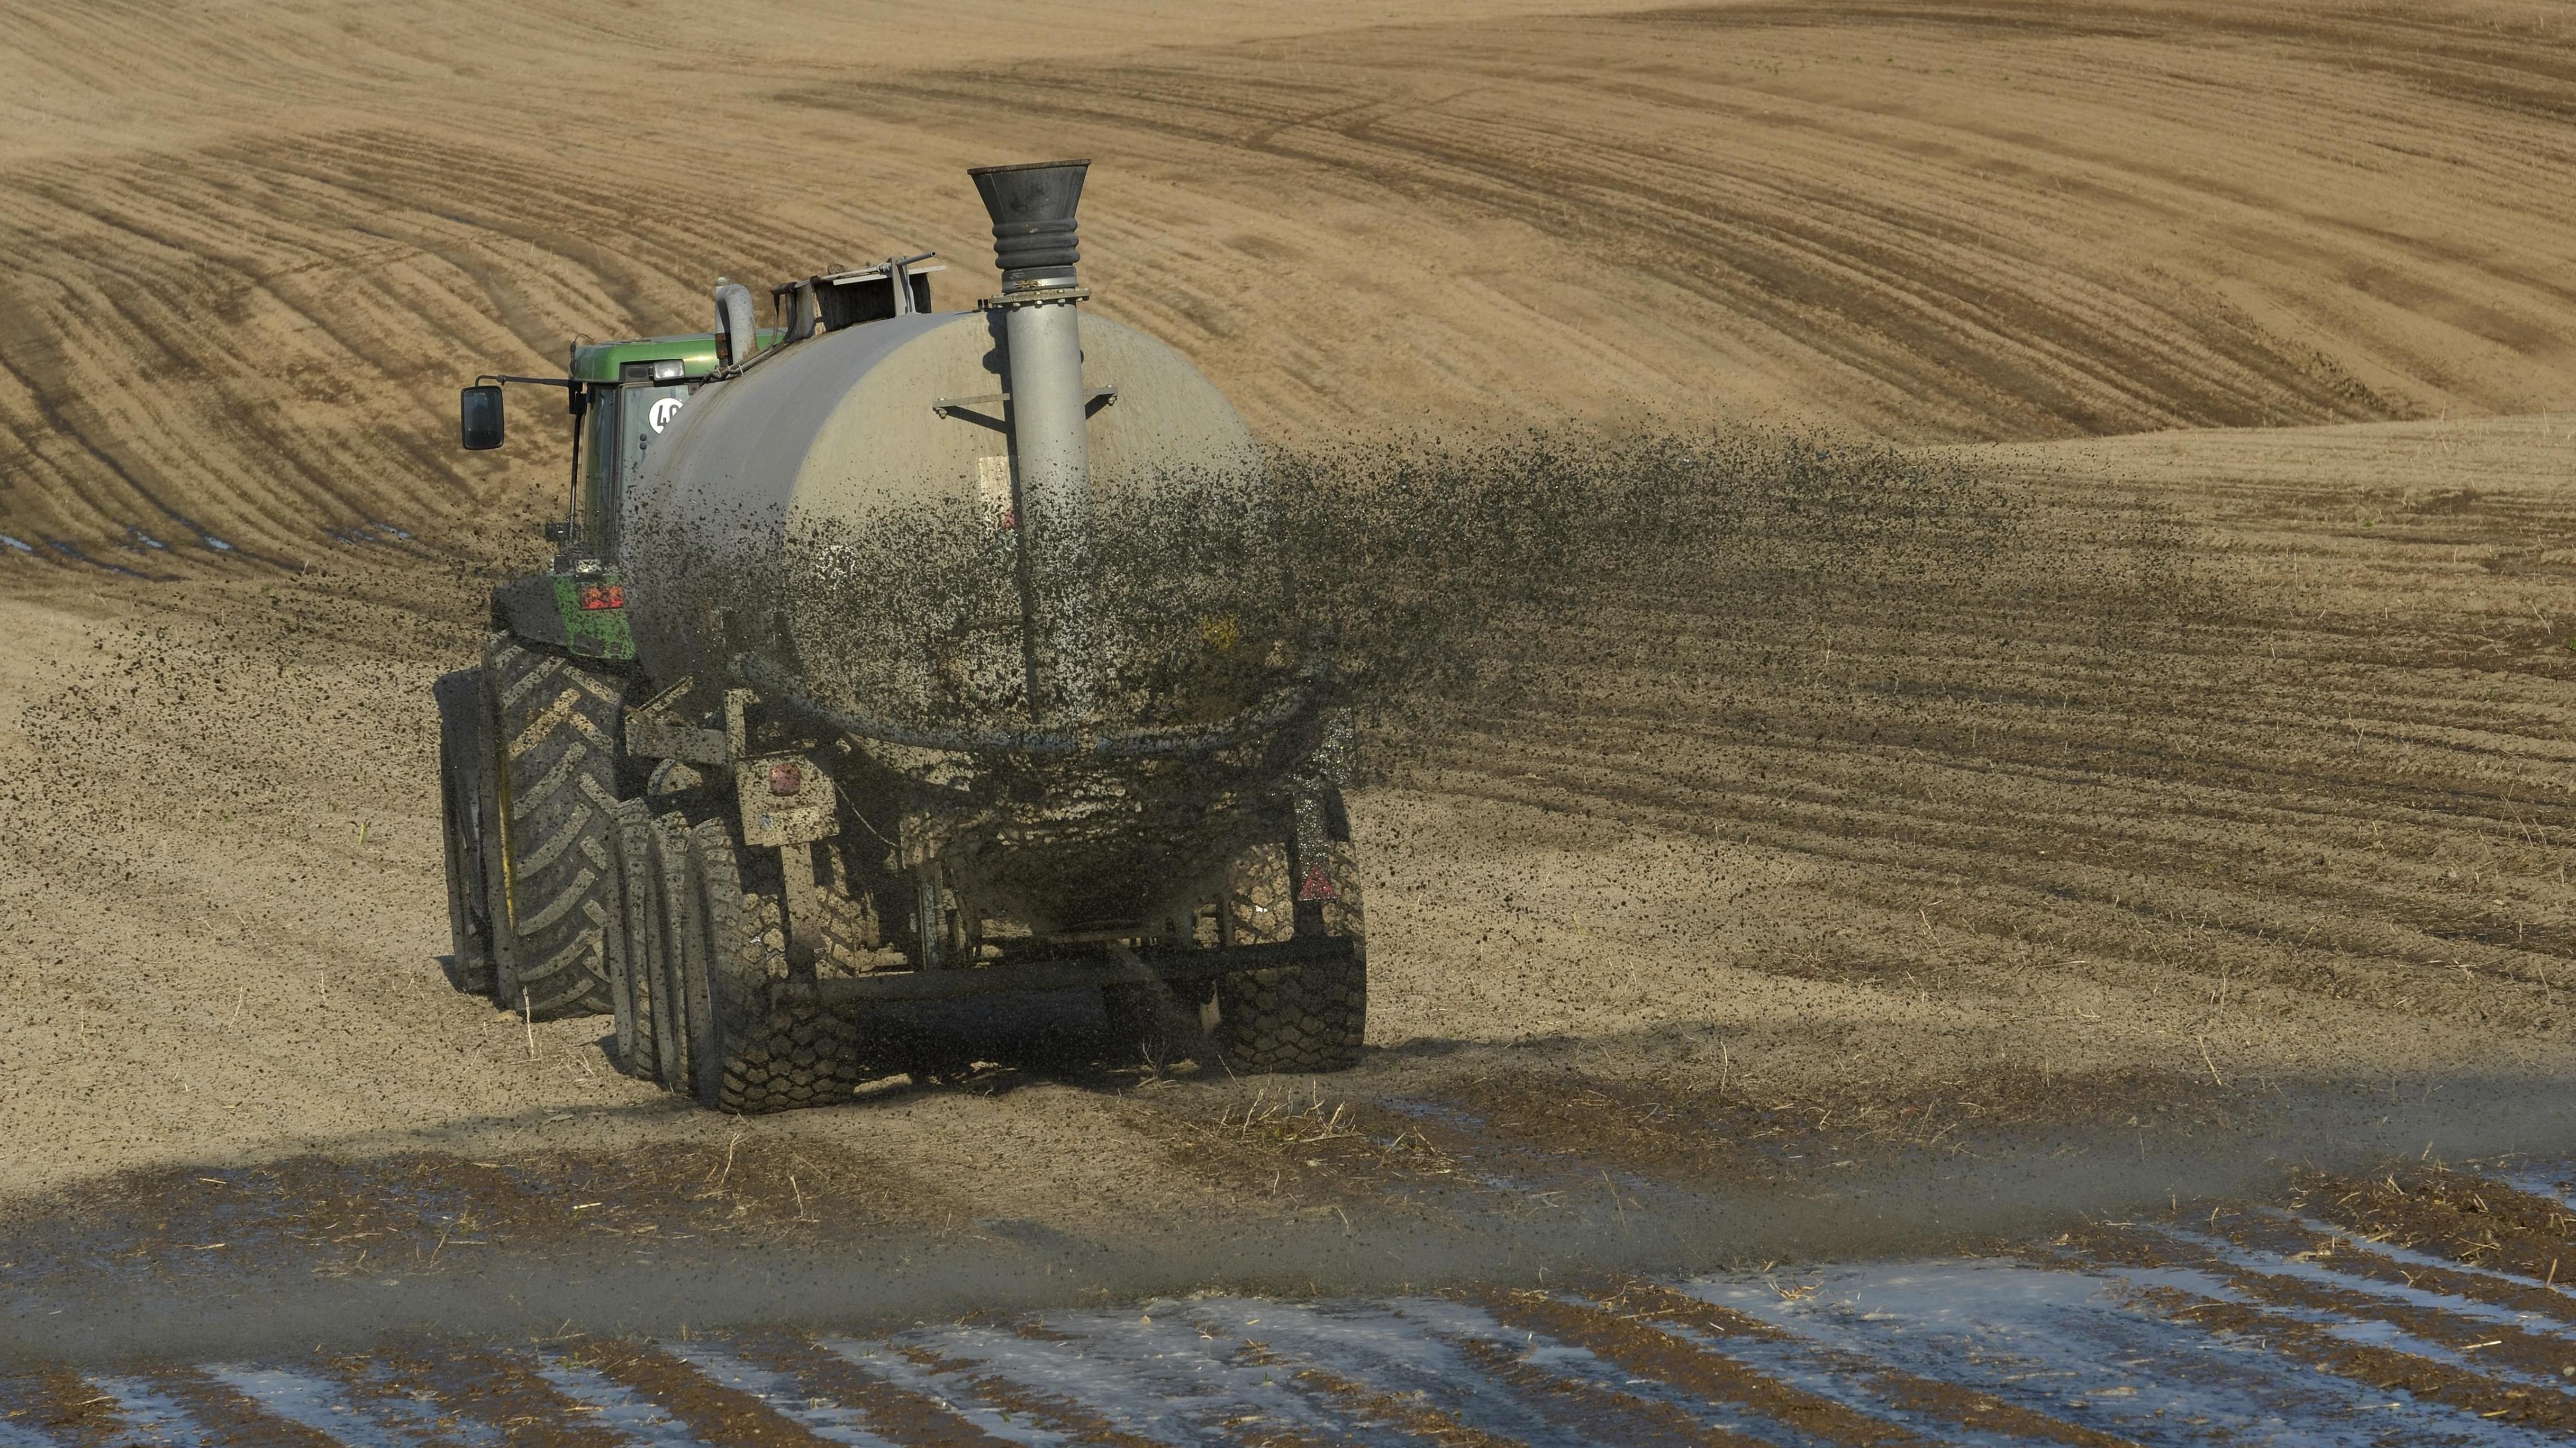 Traktor bringt Gülle auf Feld aus